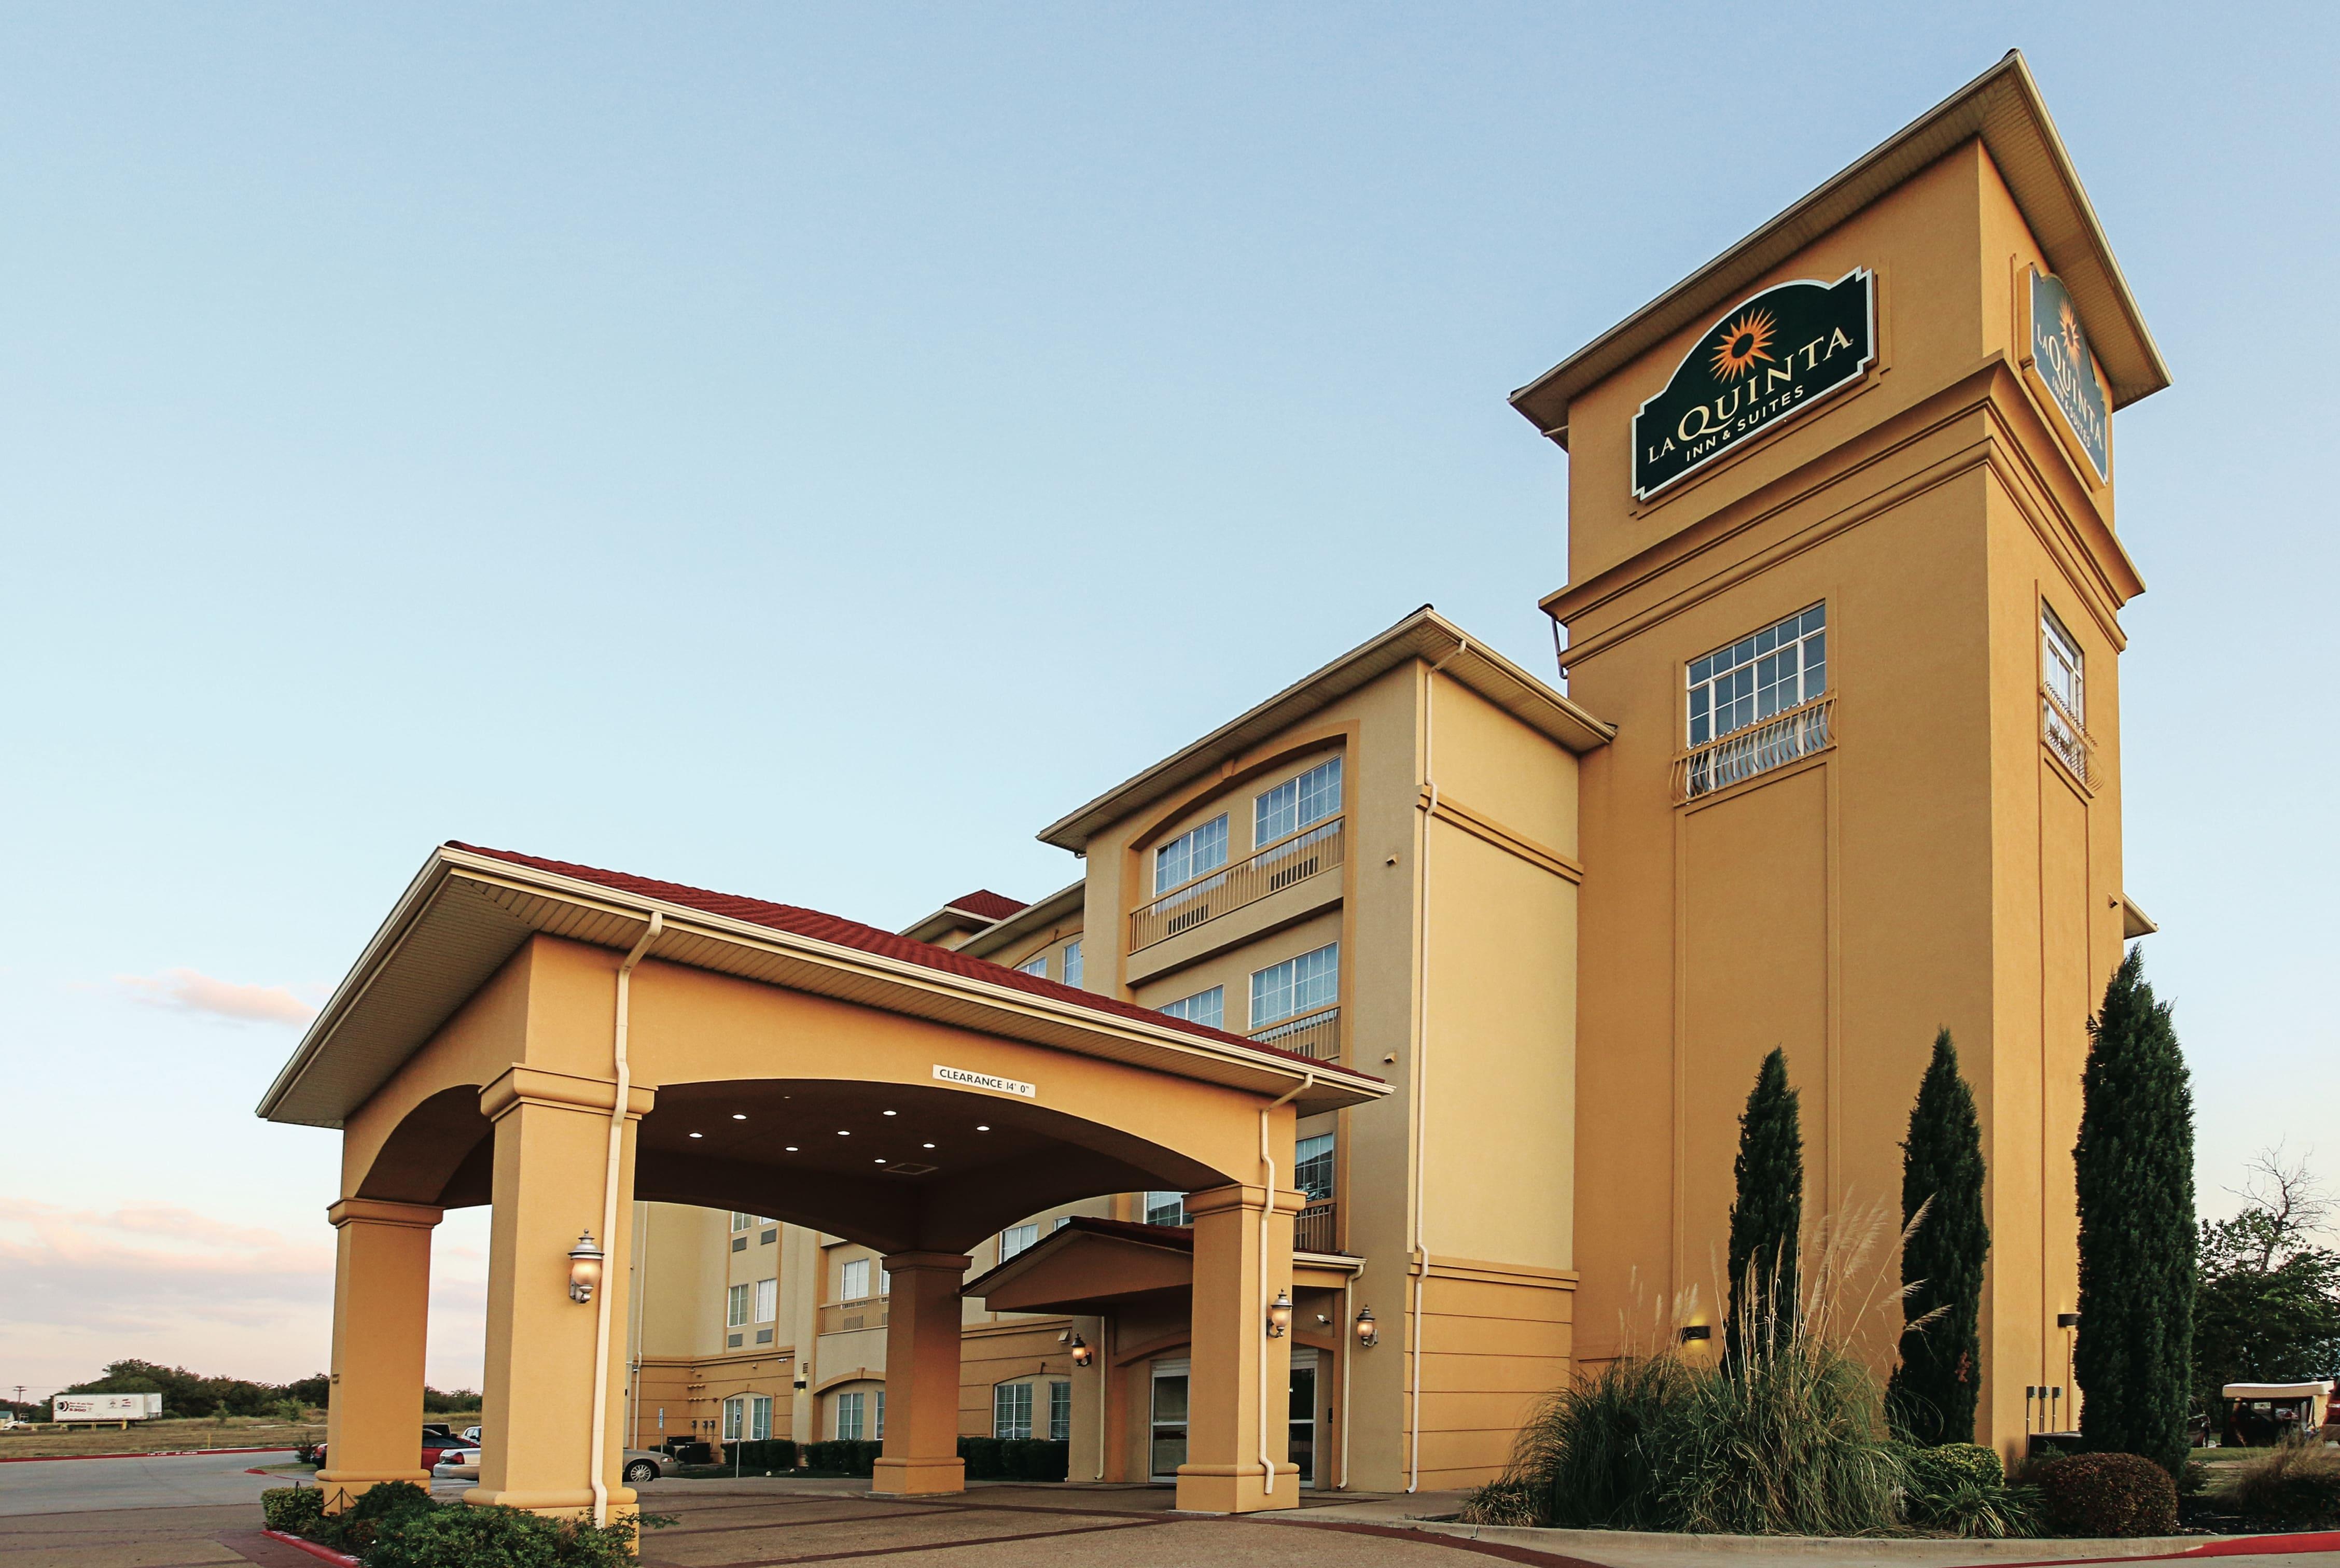 La Quinta Inn & Suites by Wyndham Dallas - Hutchins